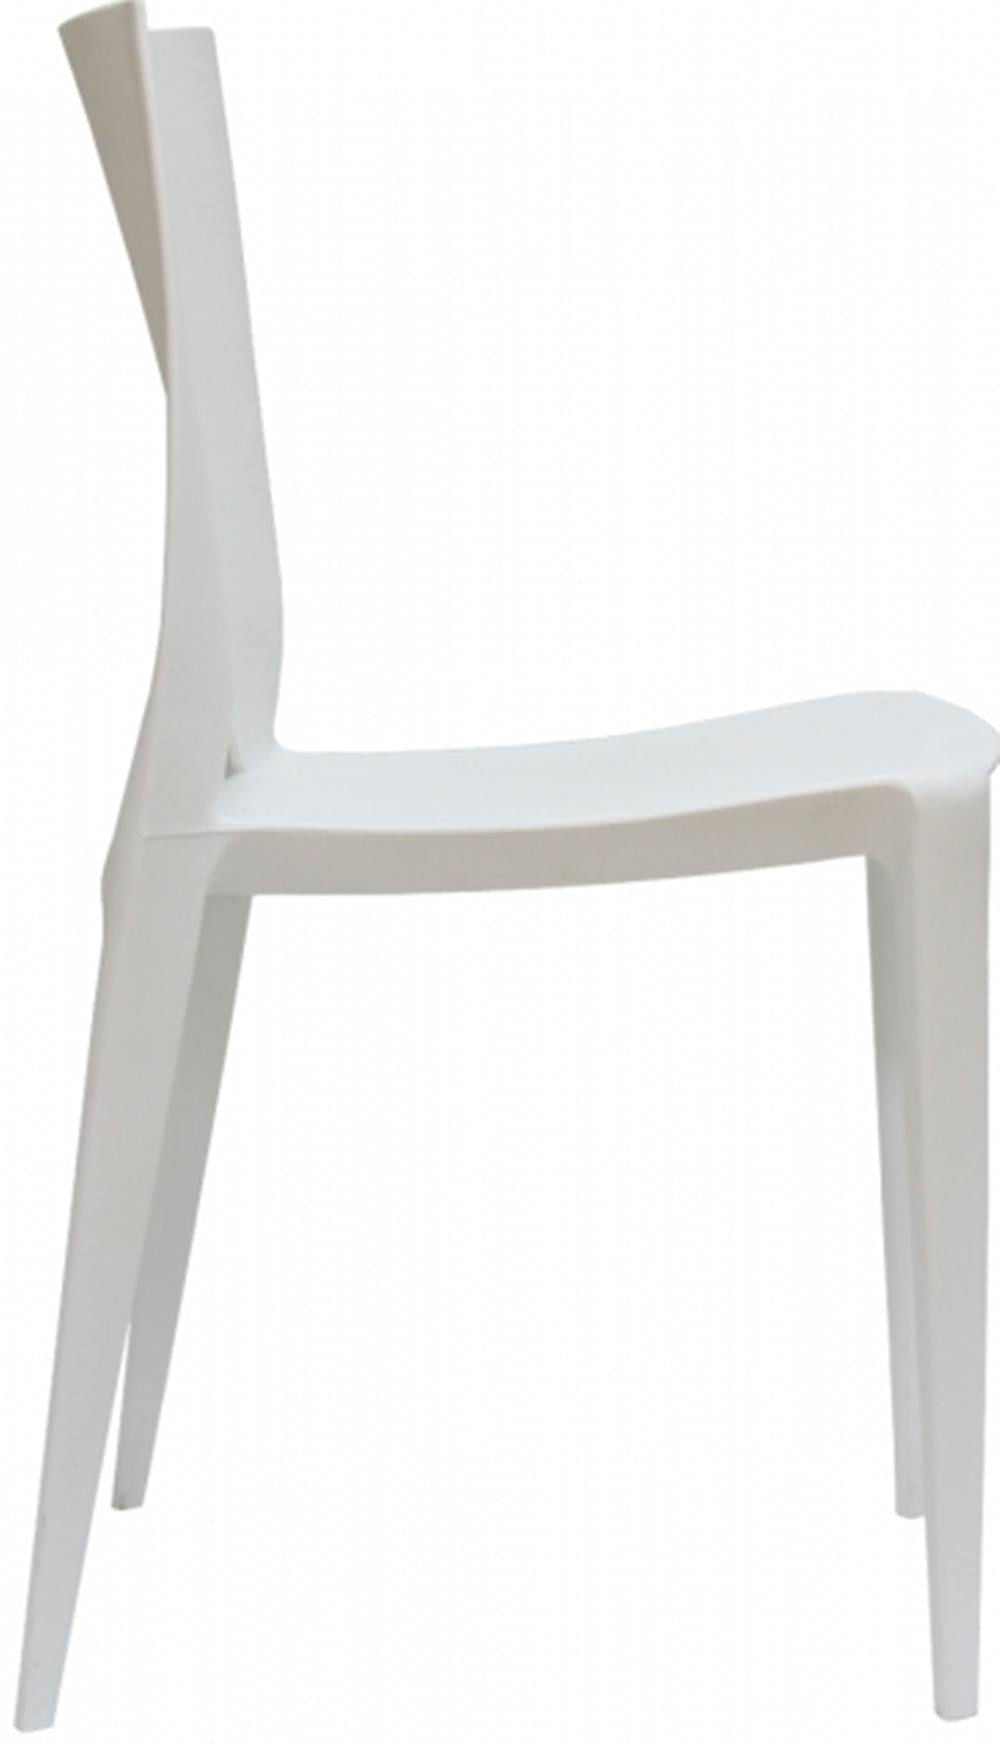 Cadeira Meia Lua Polipropileno Branco - 15126